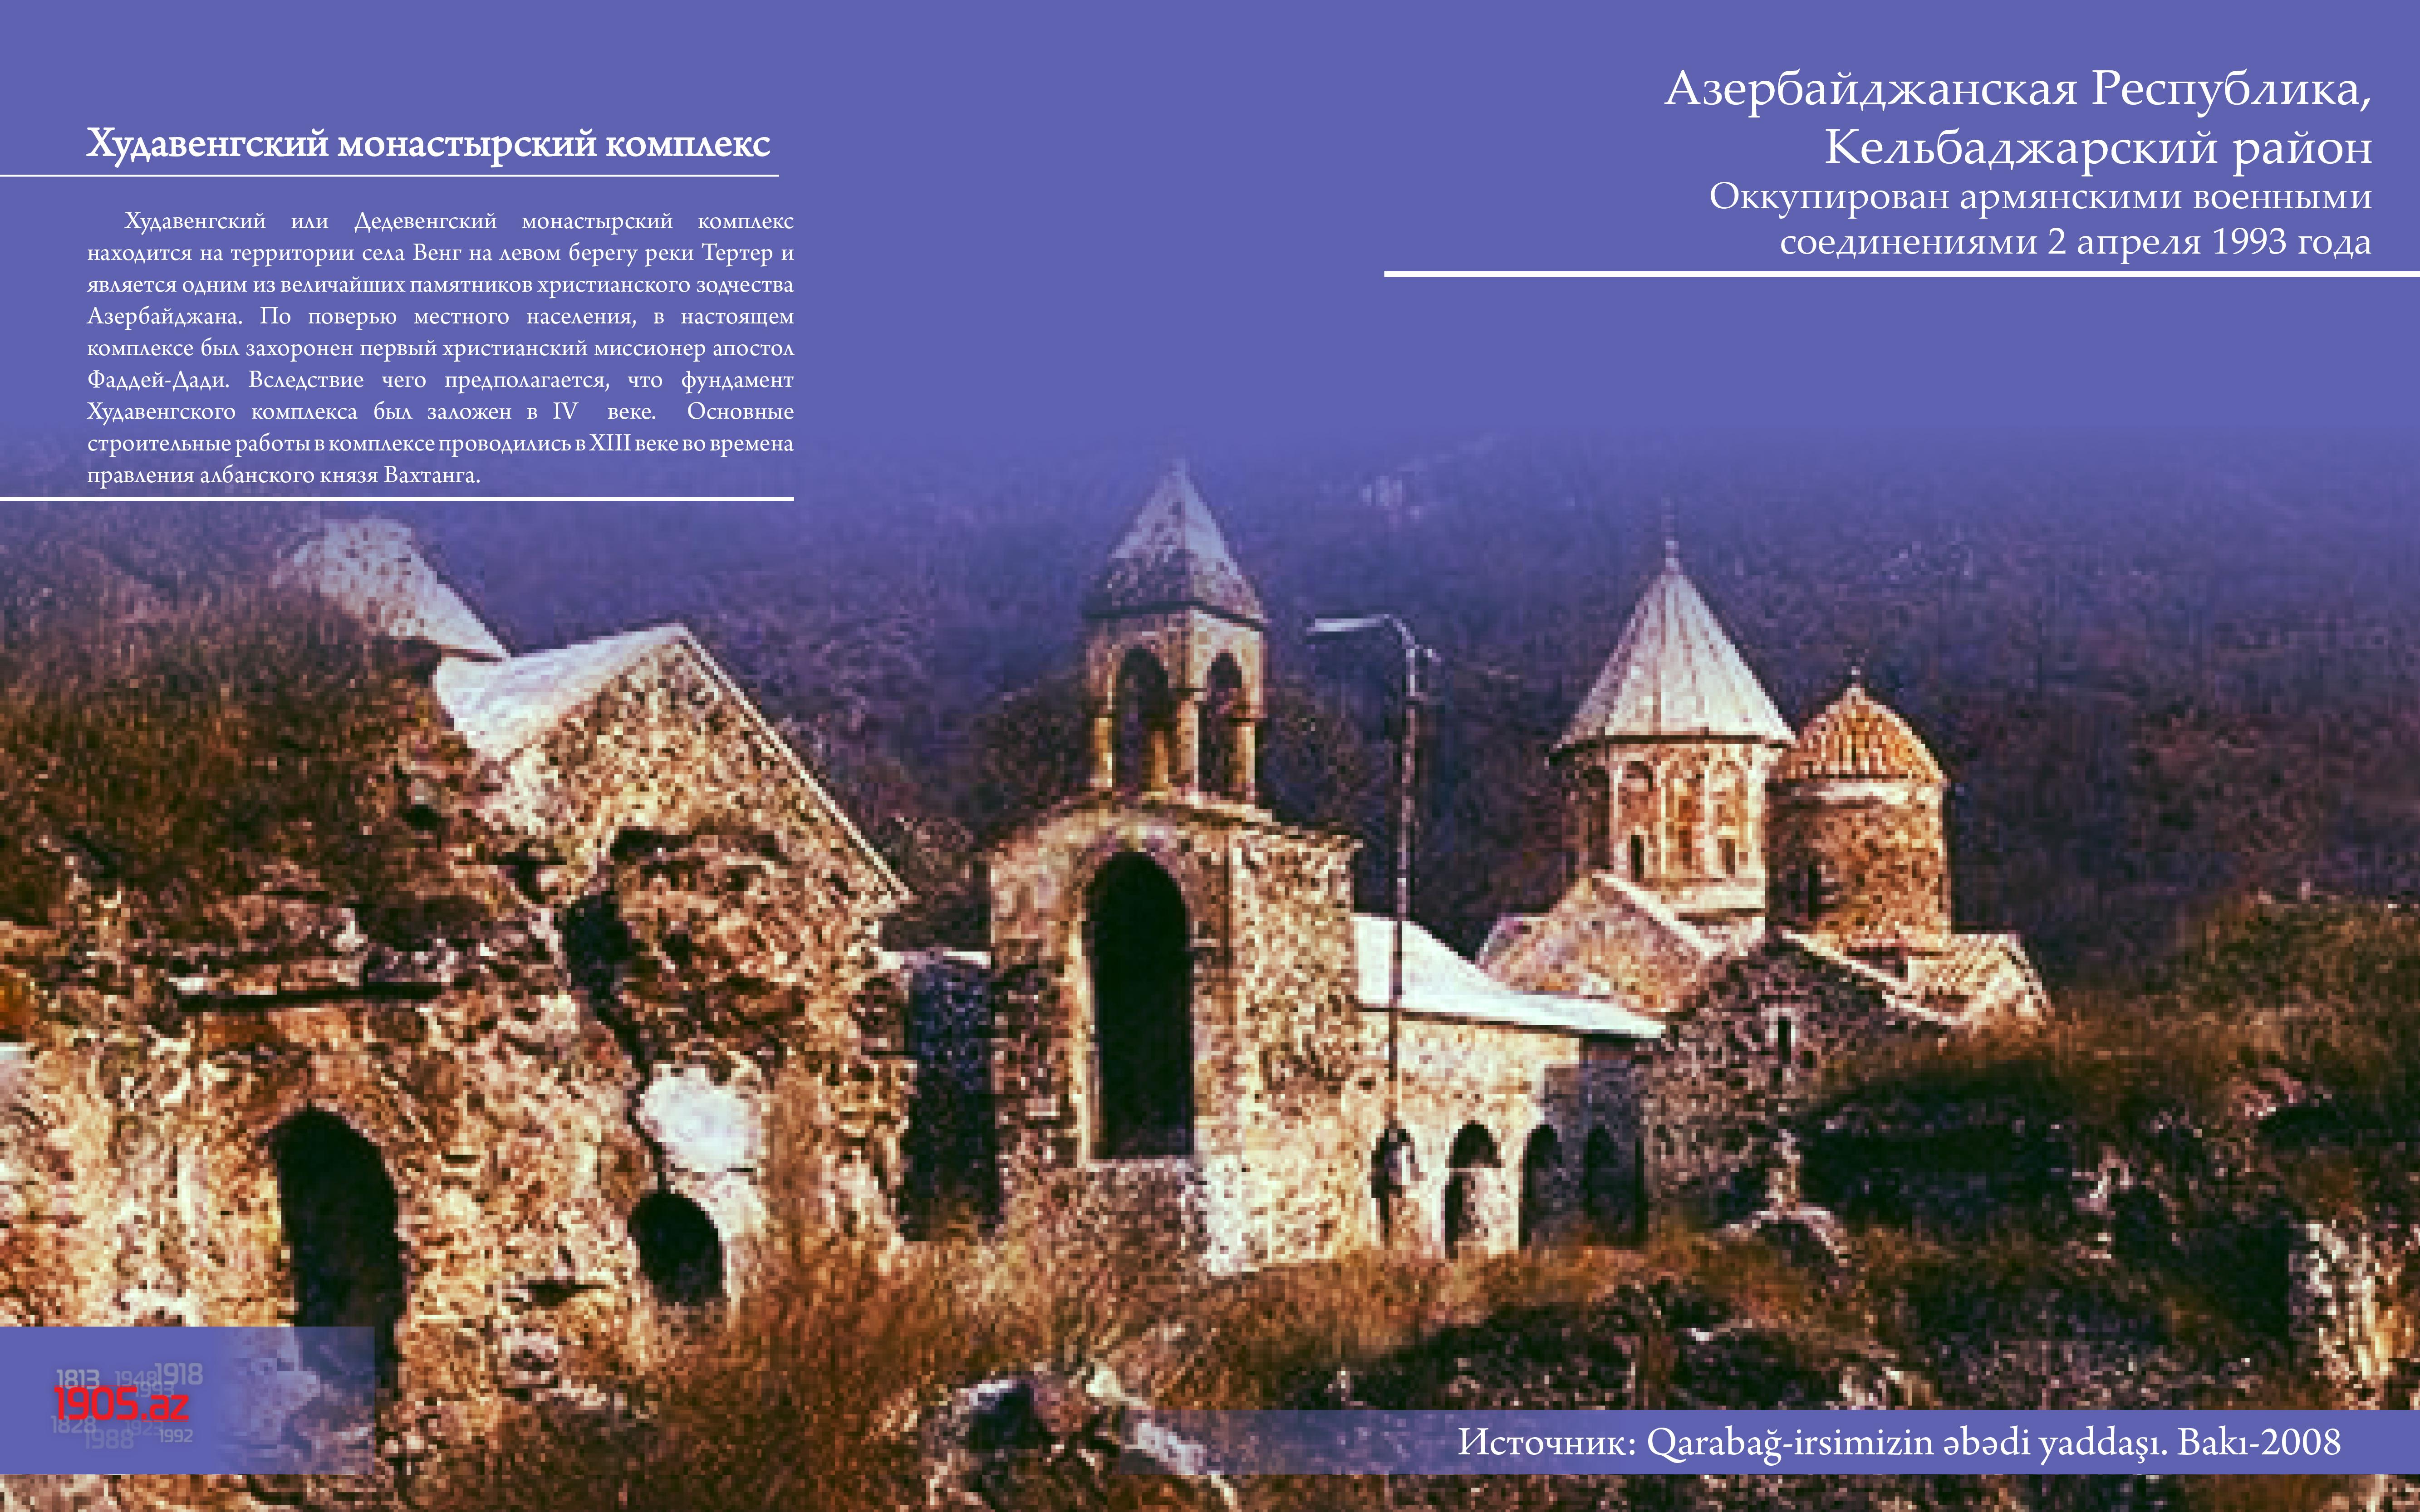 ru_wall-Худавенгский монастырский комплекс-Кельбаджарский район